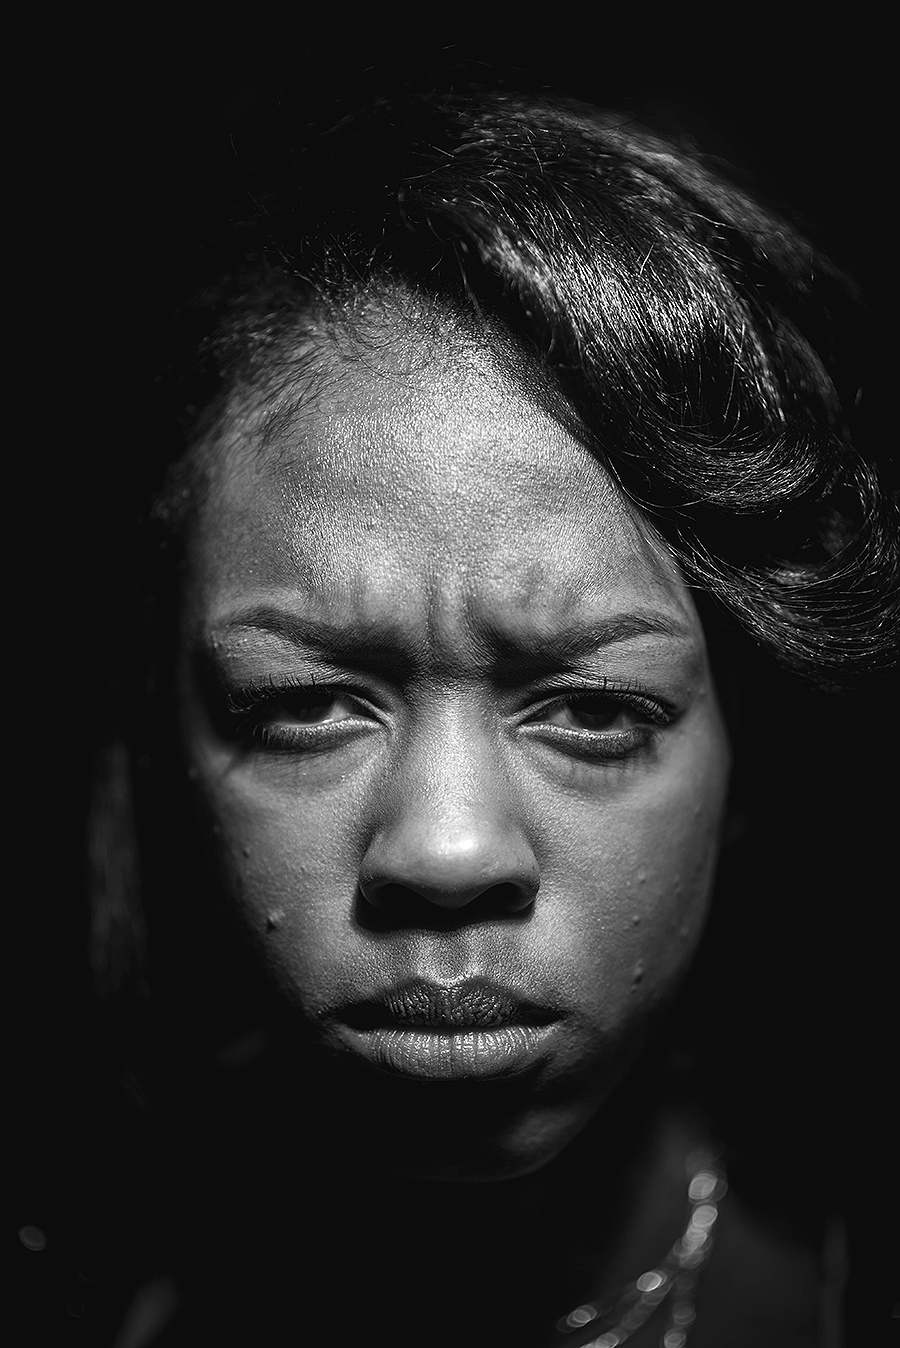 Aizhaneya_despair_photography_model_photo_emotion_portrait_headshot_kaleb_germinaro